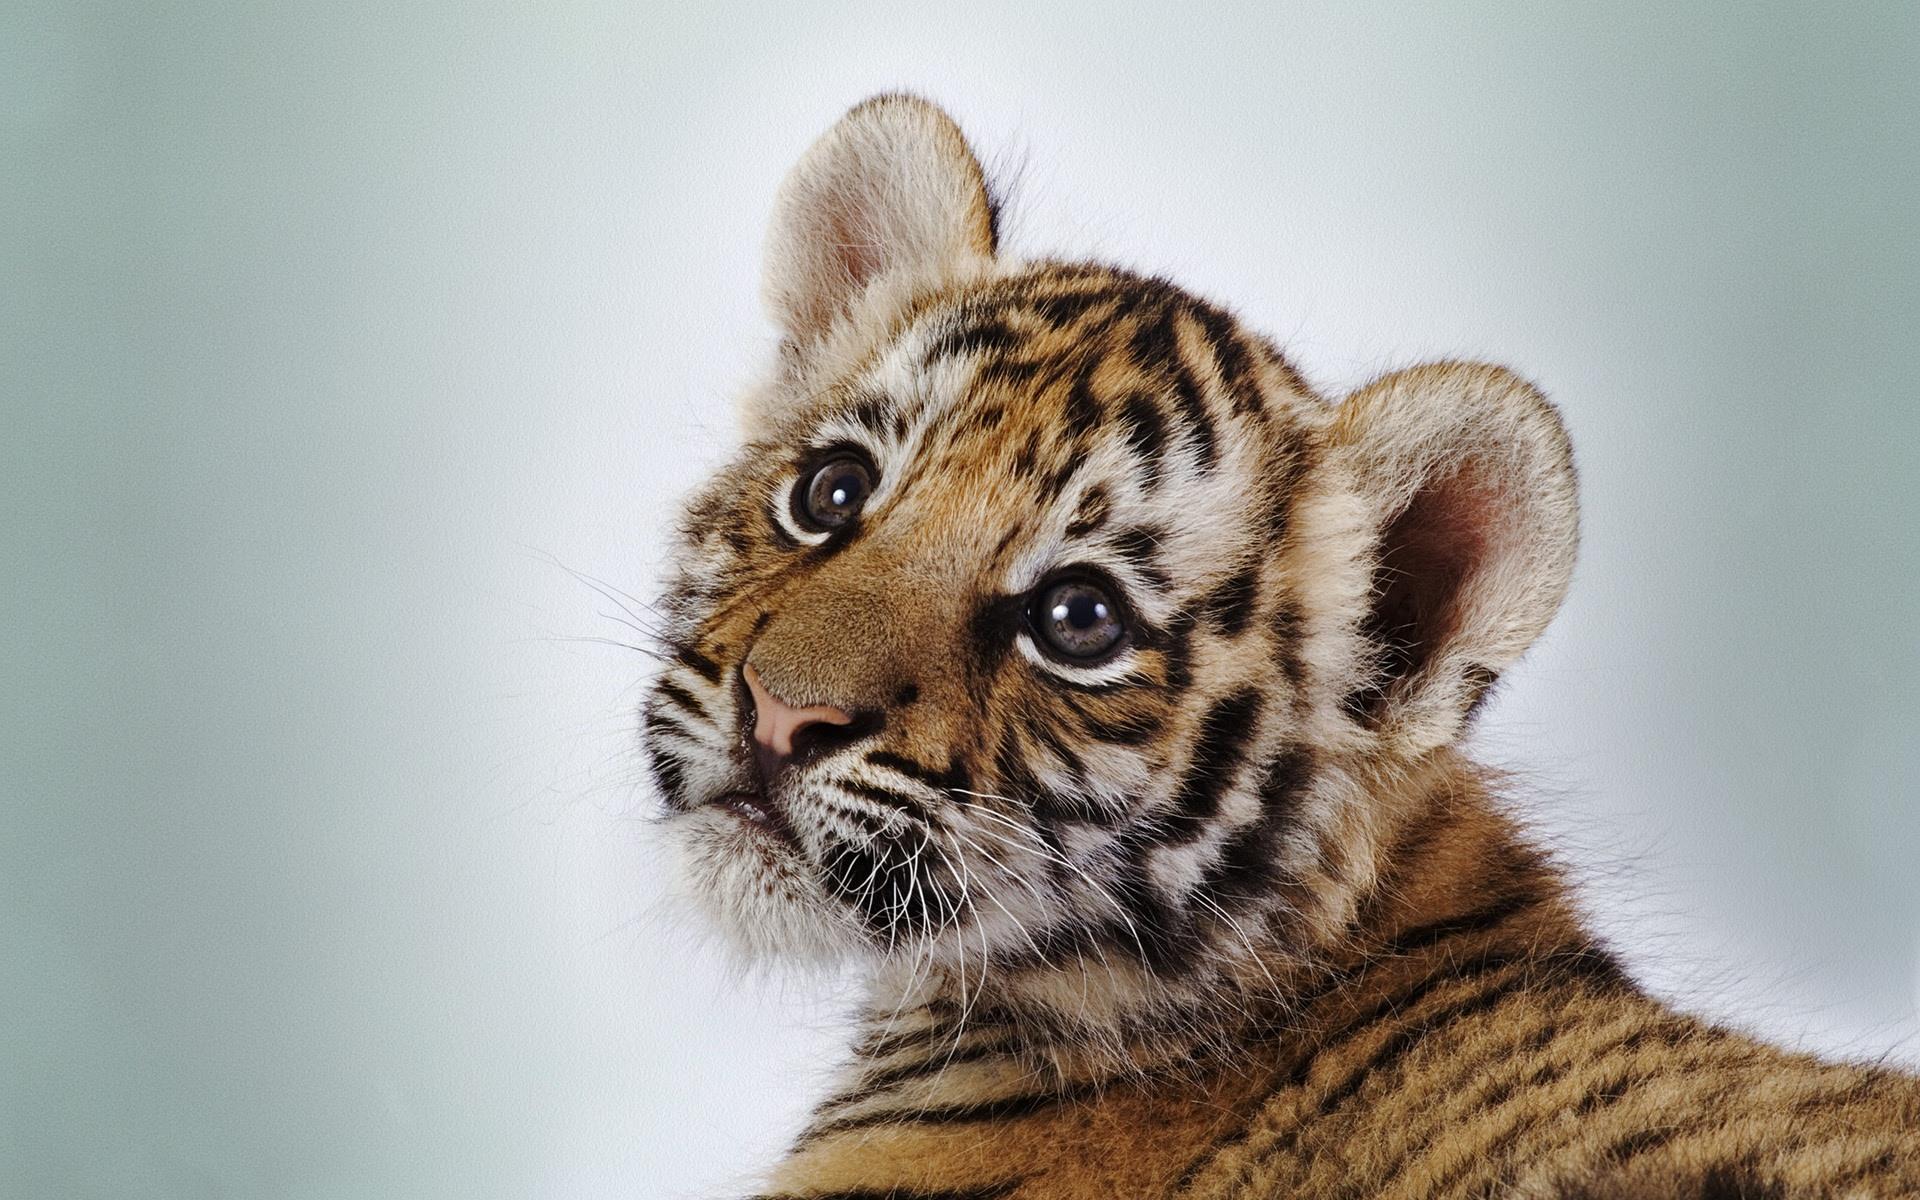 Baby Tiger desktop wallpaper 1920x1200